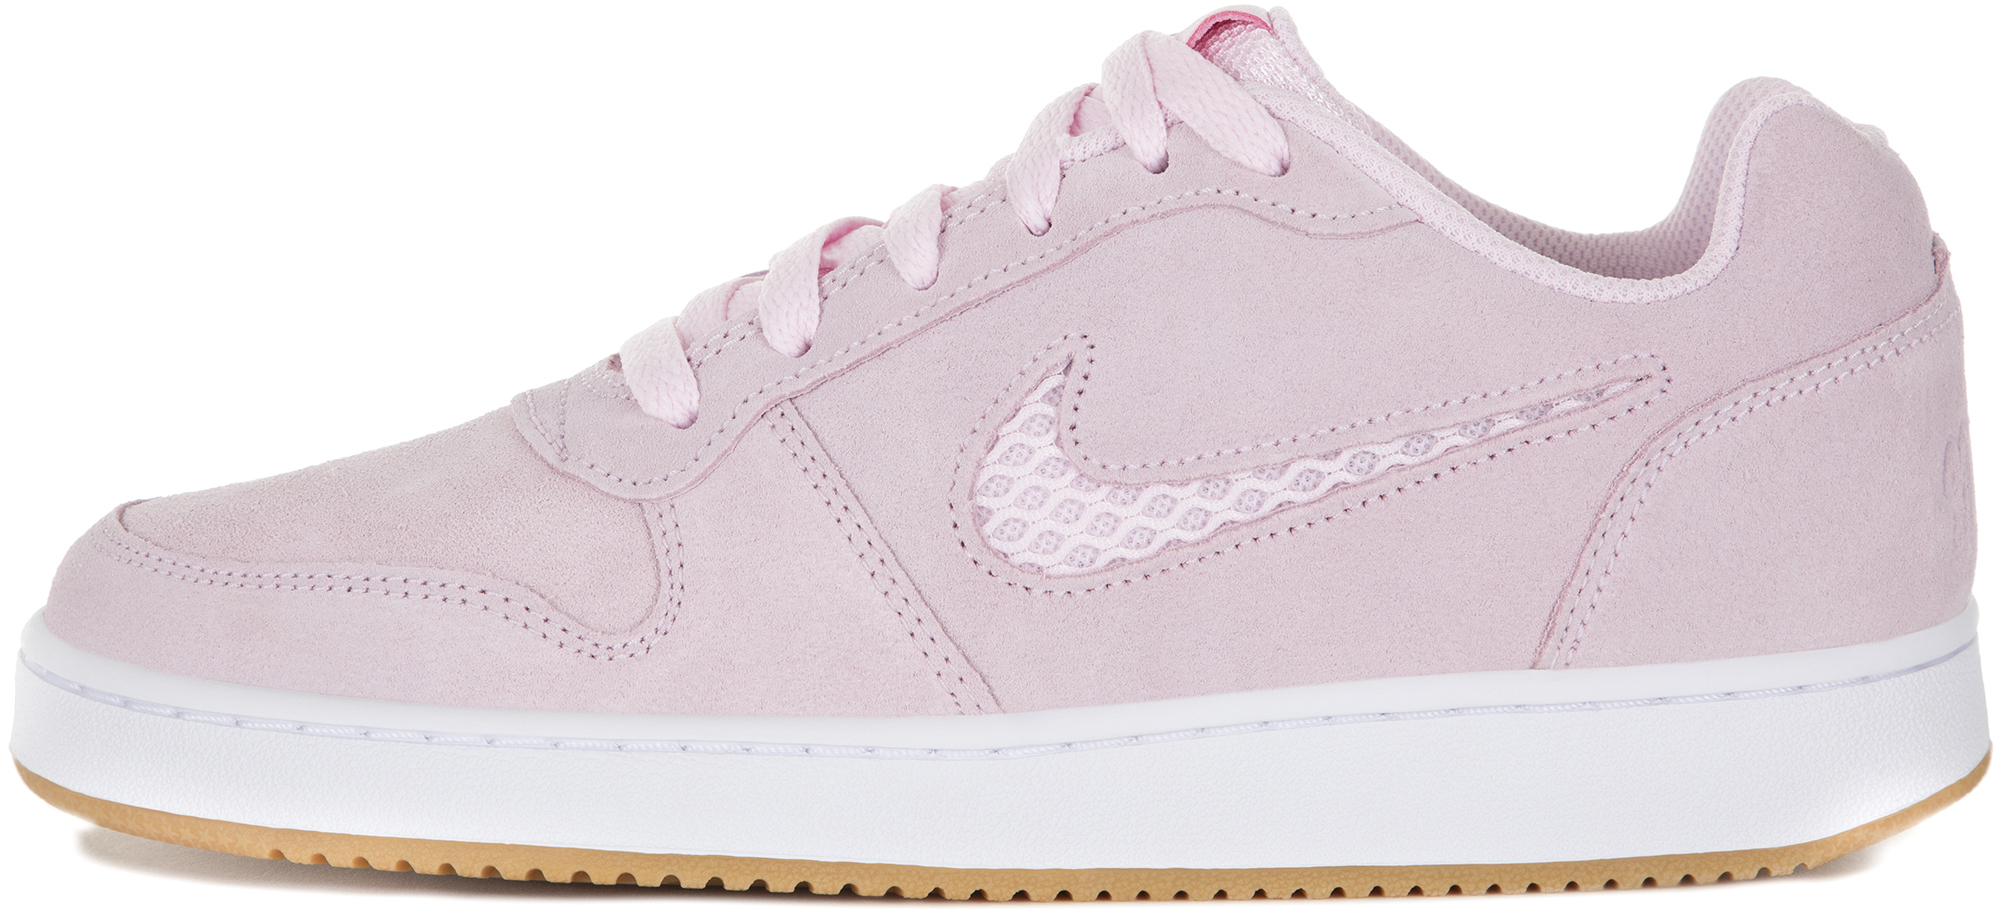 Nike Кеды женские Nike Ebernon Low Premium, размер 39,5